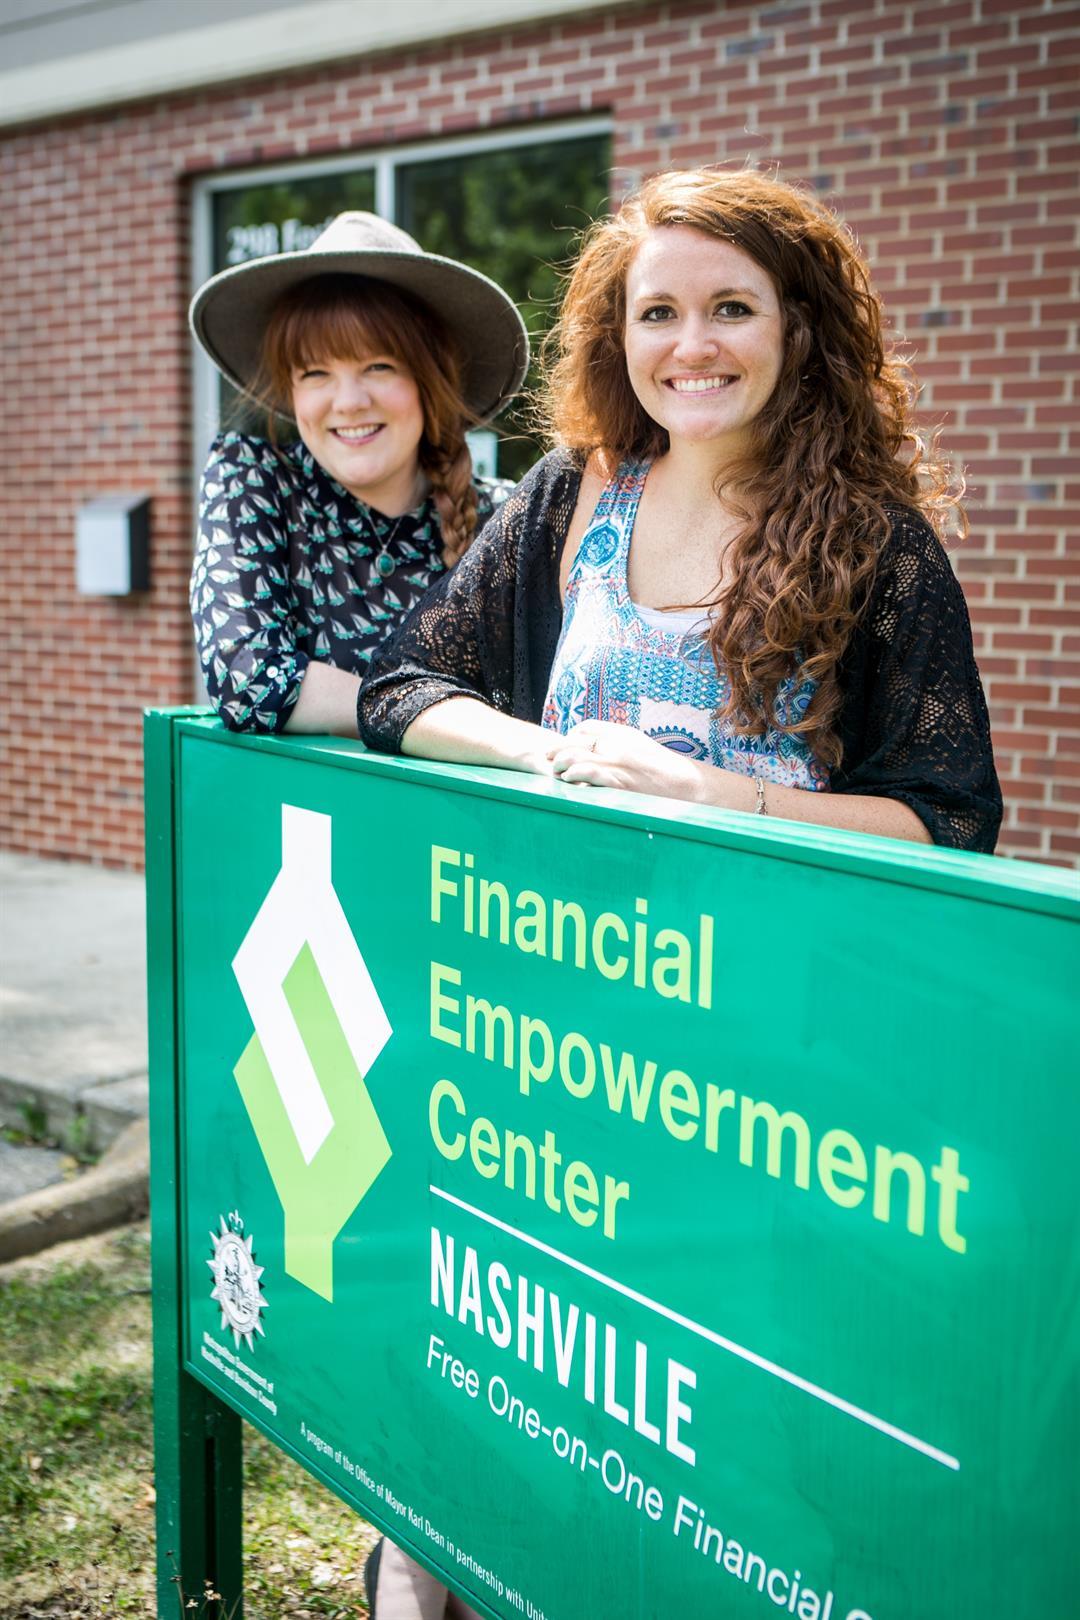 Nashville Financial Empowerment Center (Source: CFE Fund)